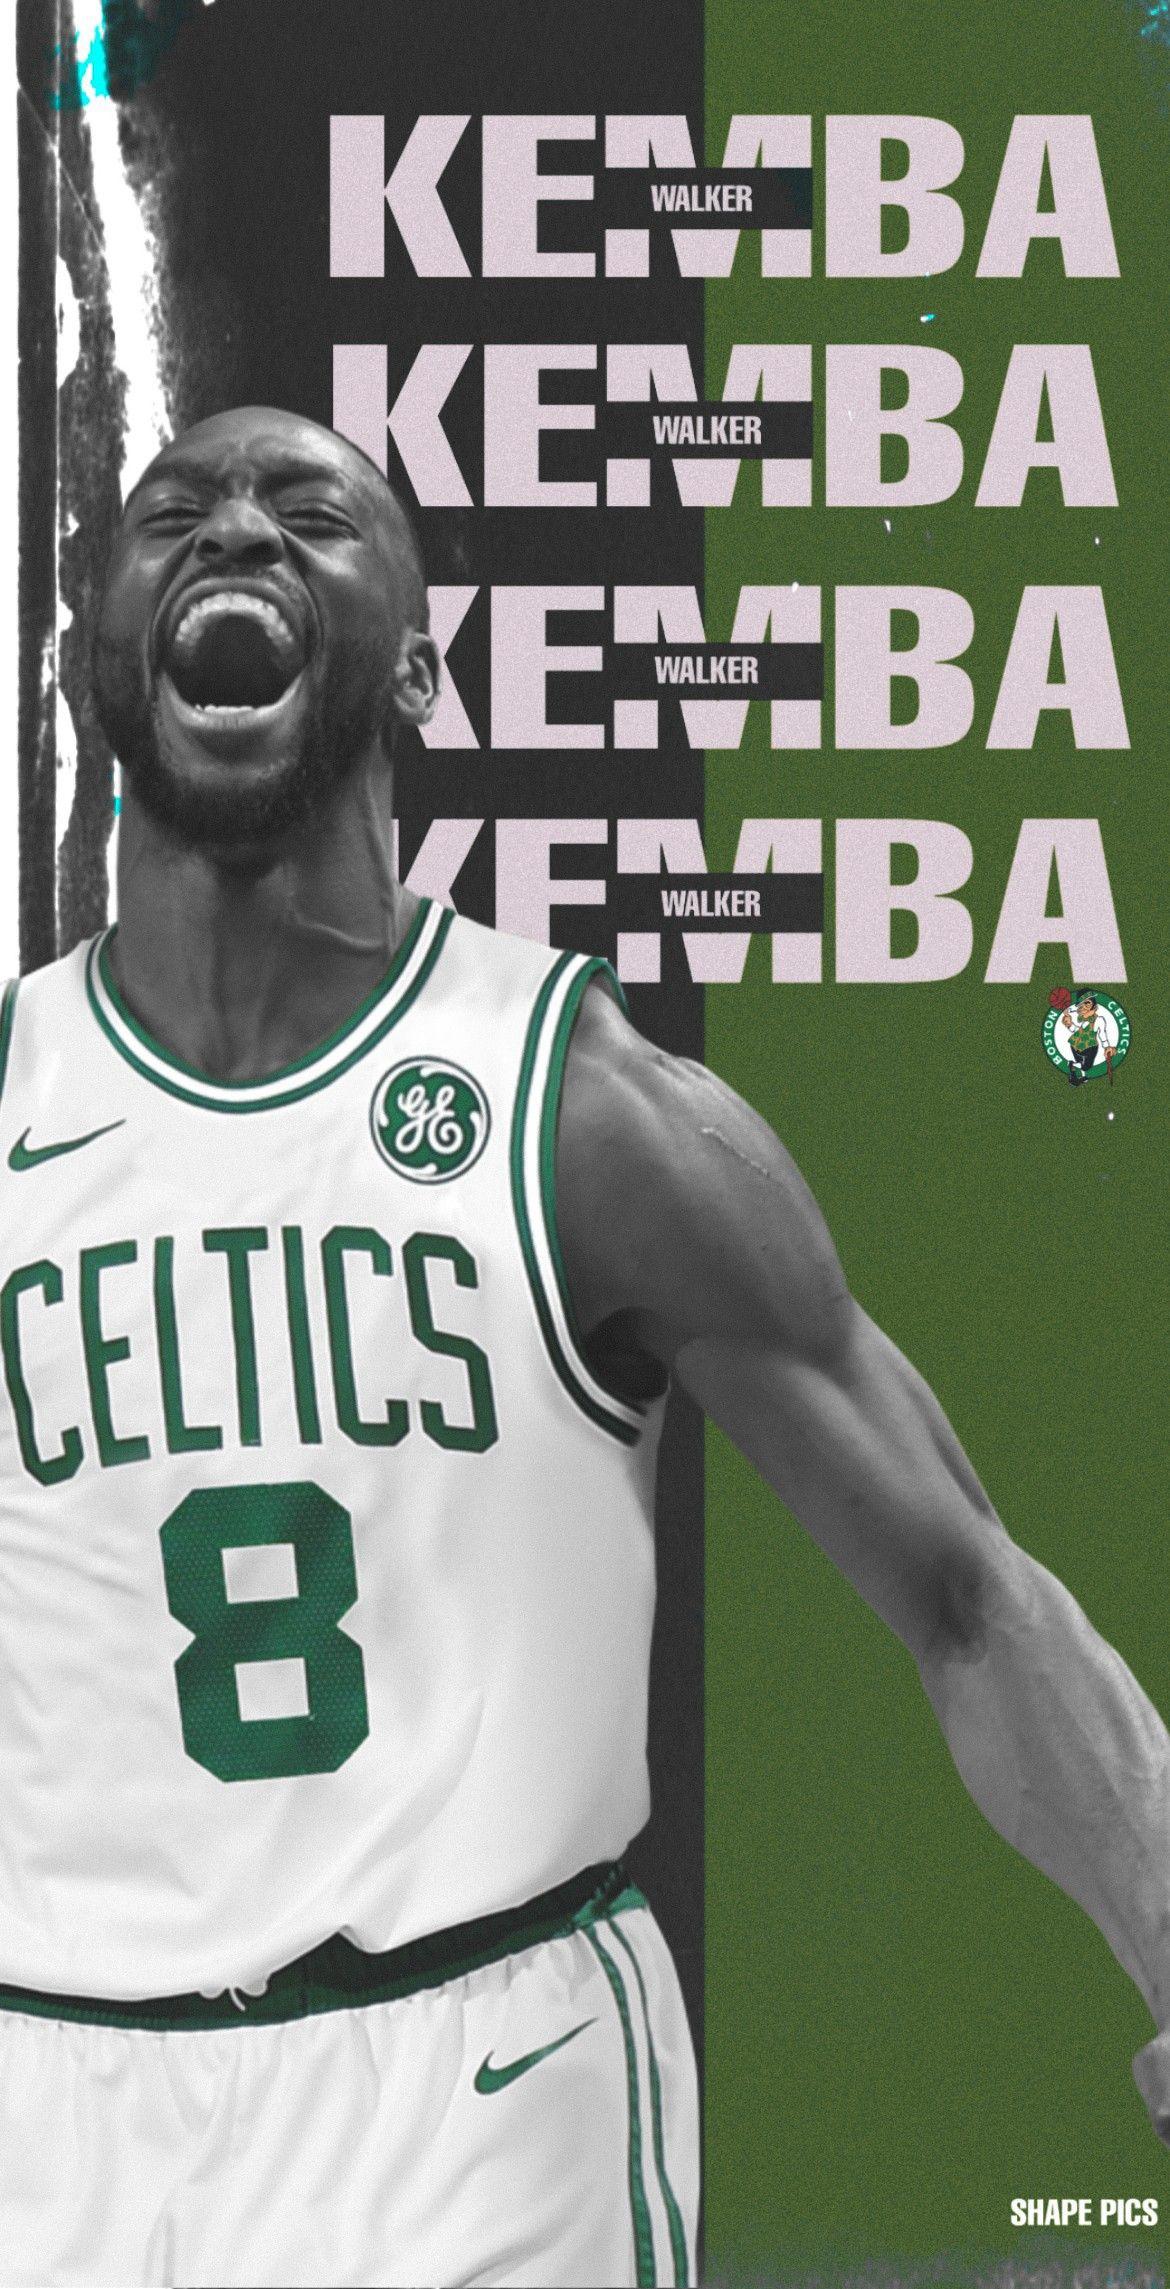 Pin By Aldo 07 On Nba Kobe Bryant Wallpaper Kemba Walker Boston Celtics